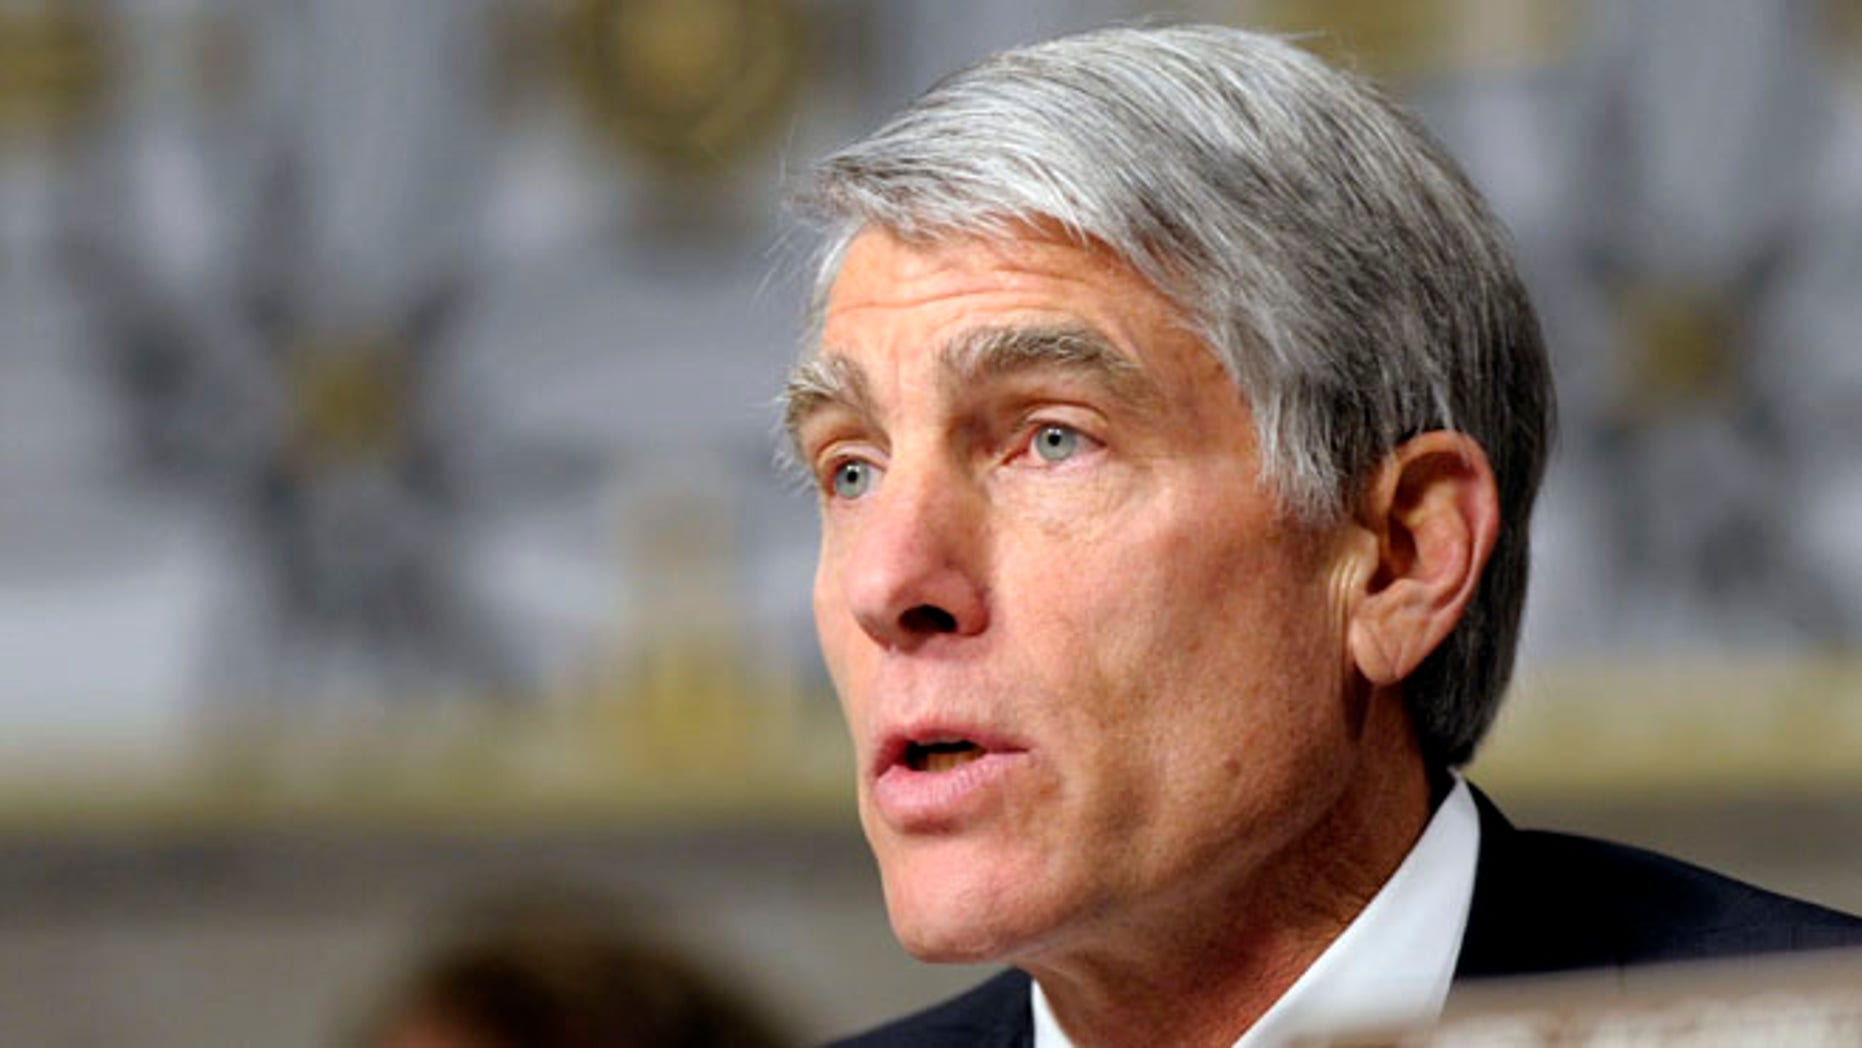 Jan. 31, 2013: Sen. Mark Udall, D-Colo., speaks on Capitol Hill in Washington.